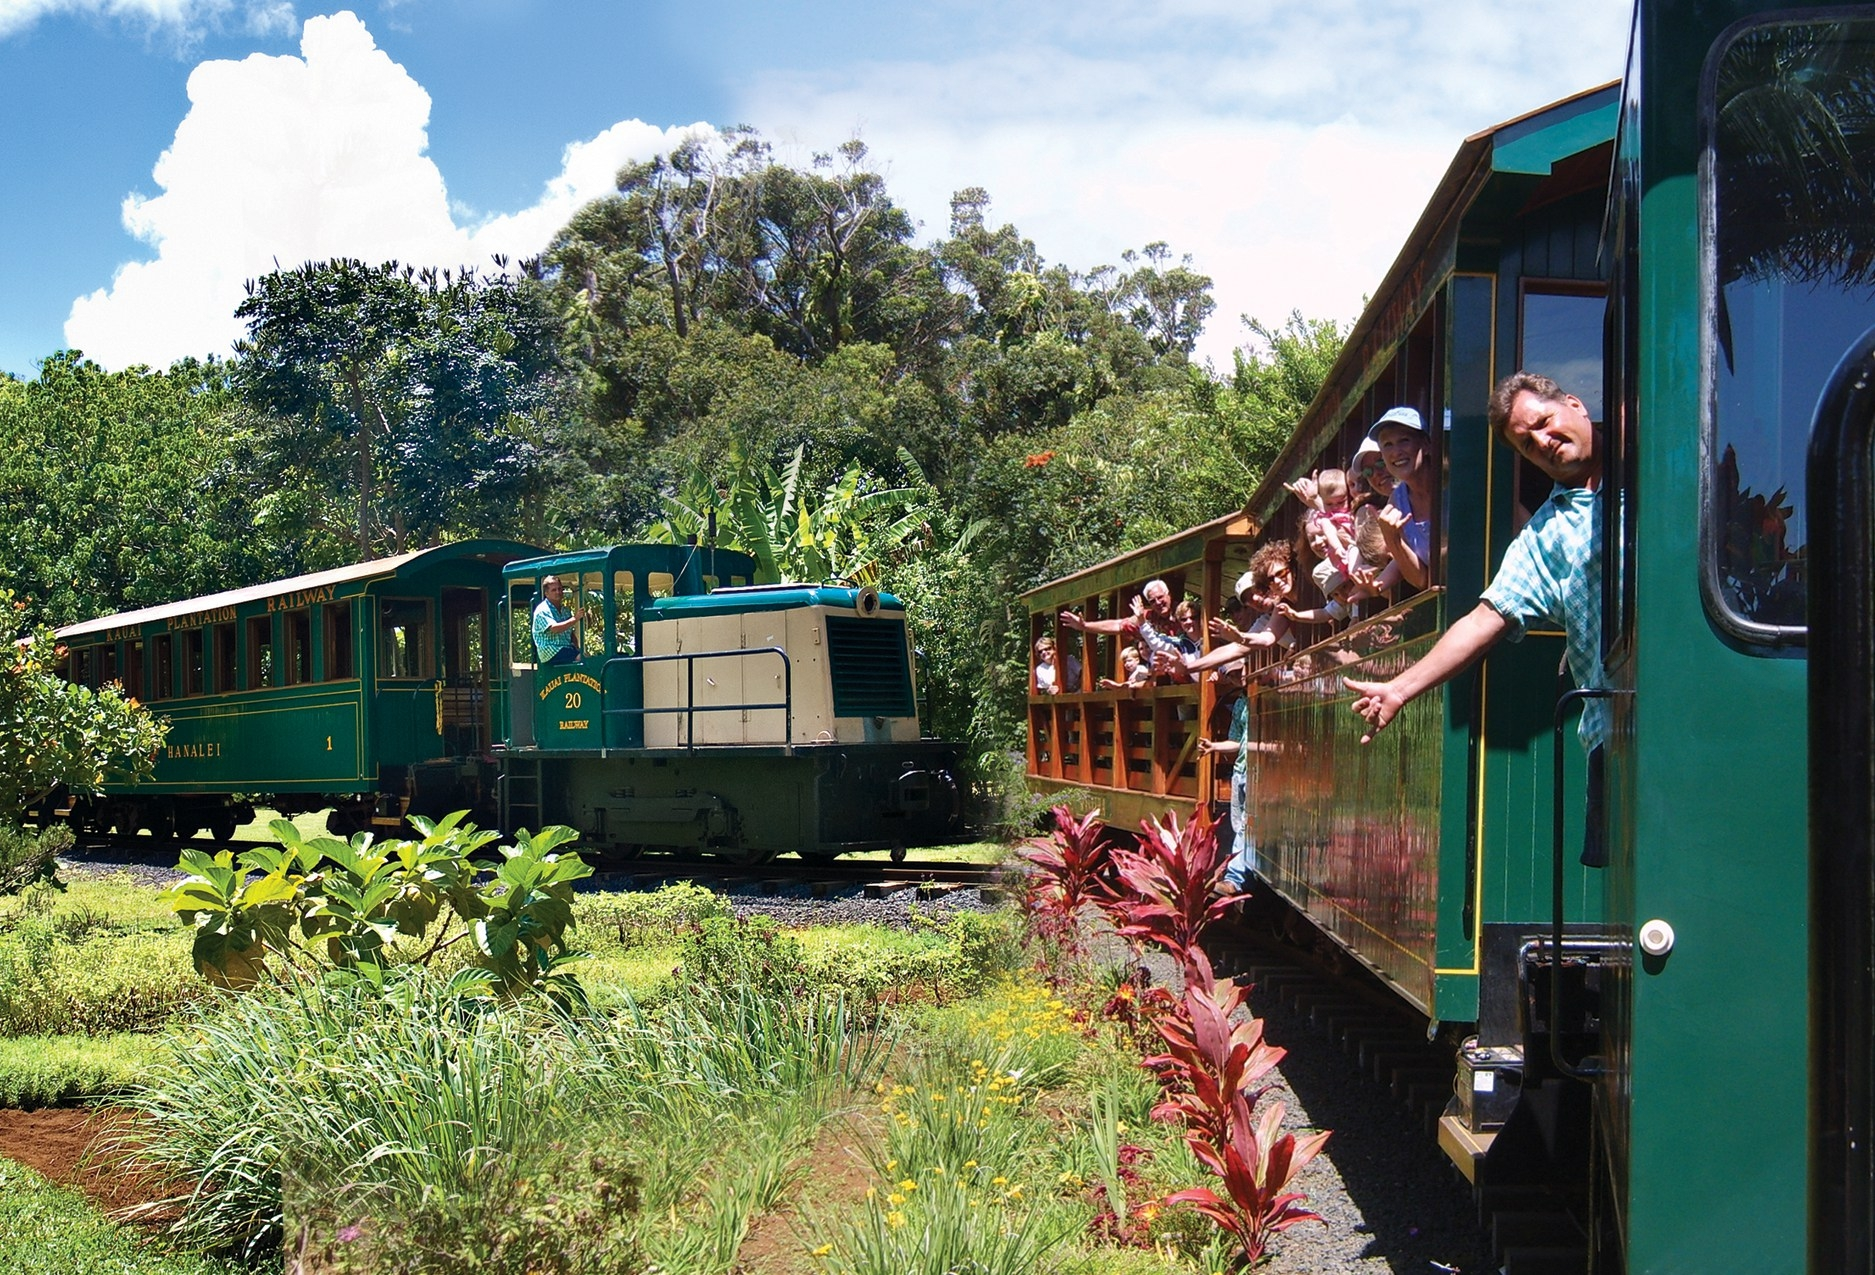 cool things to do in Kauai, Hawaii (train)